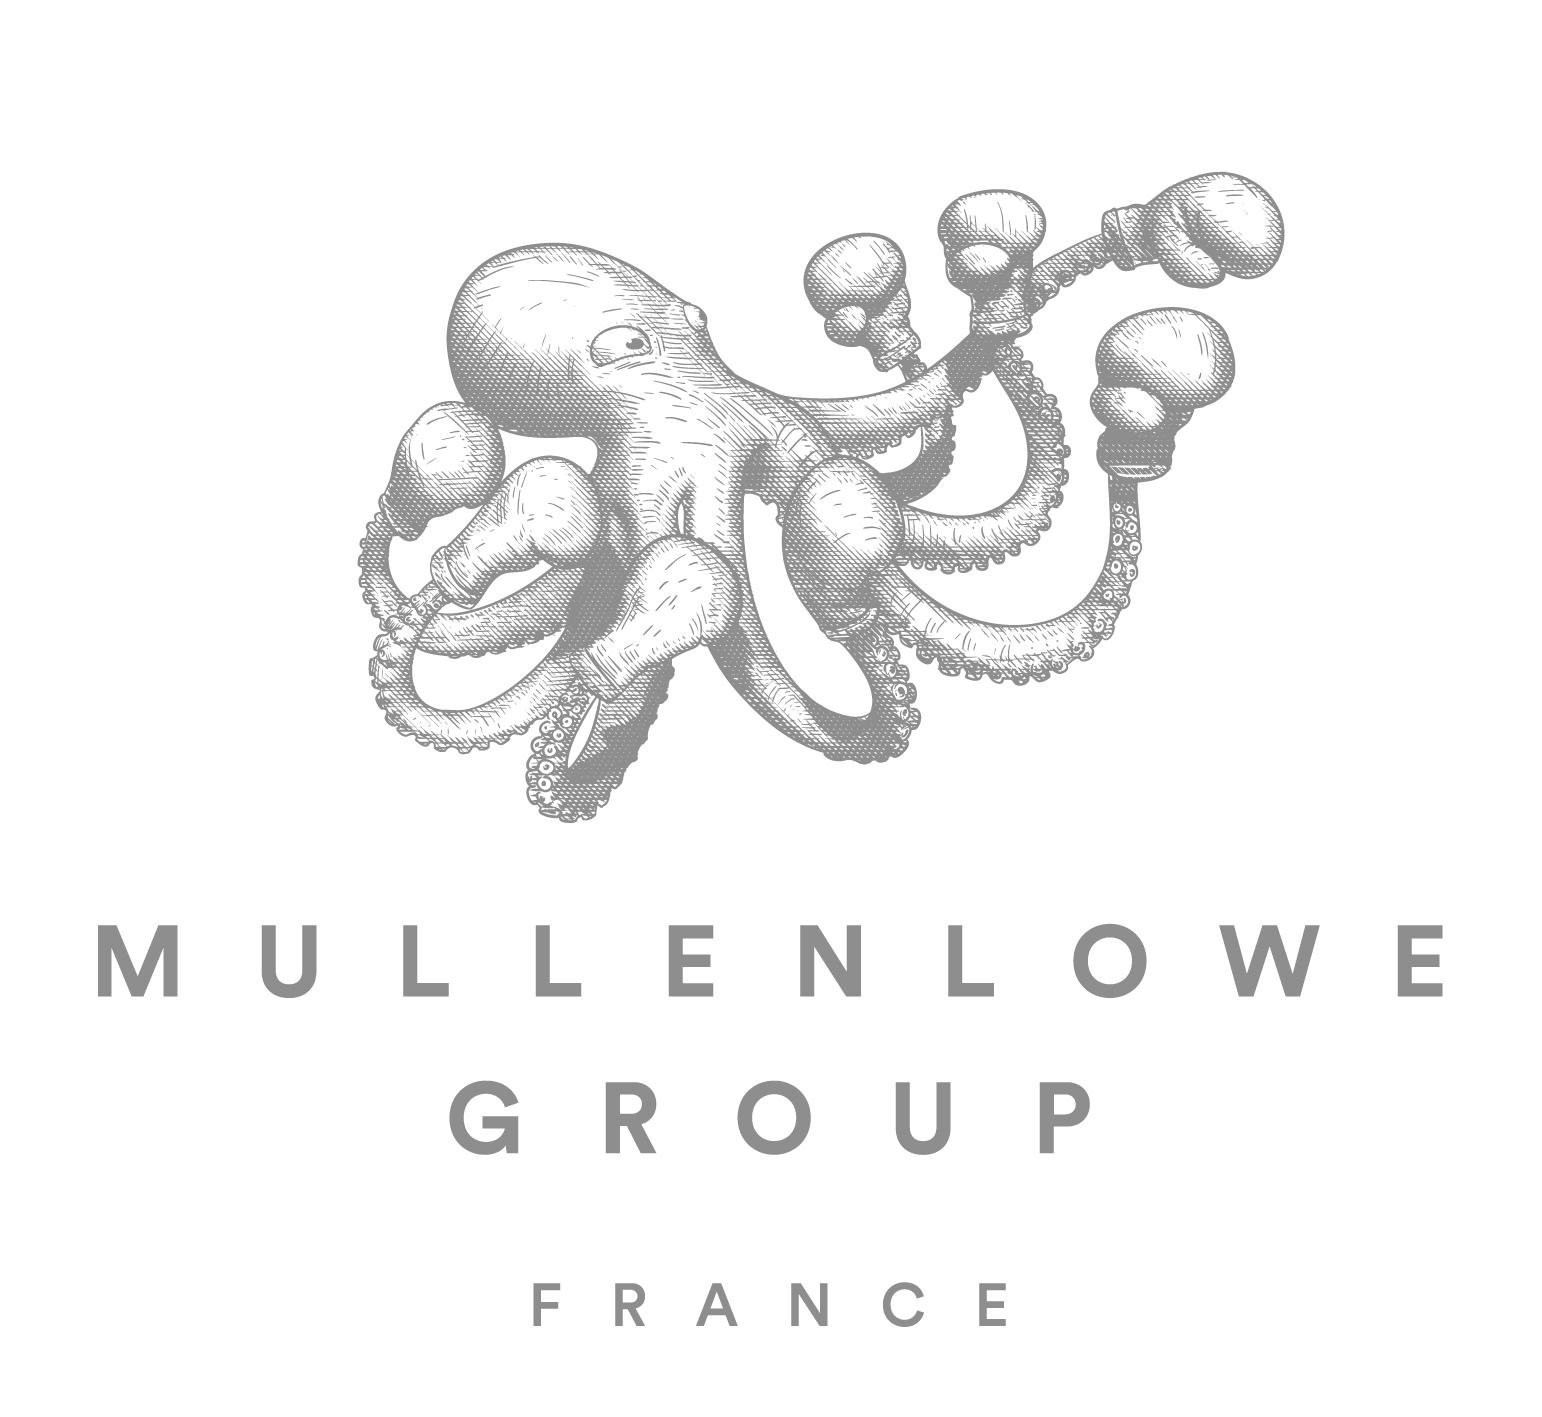 MullenLowe France